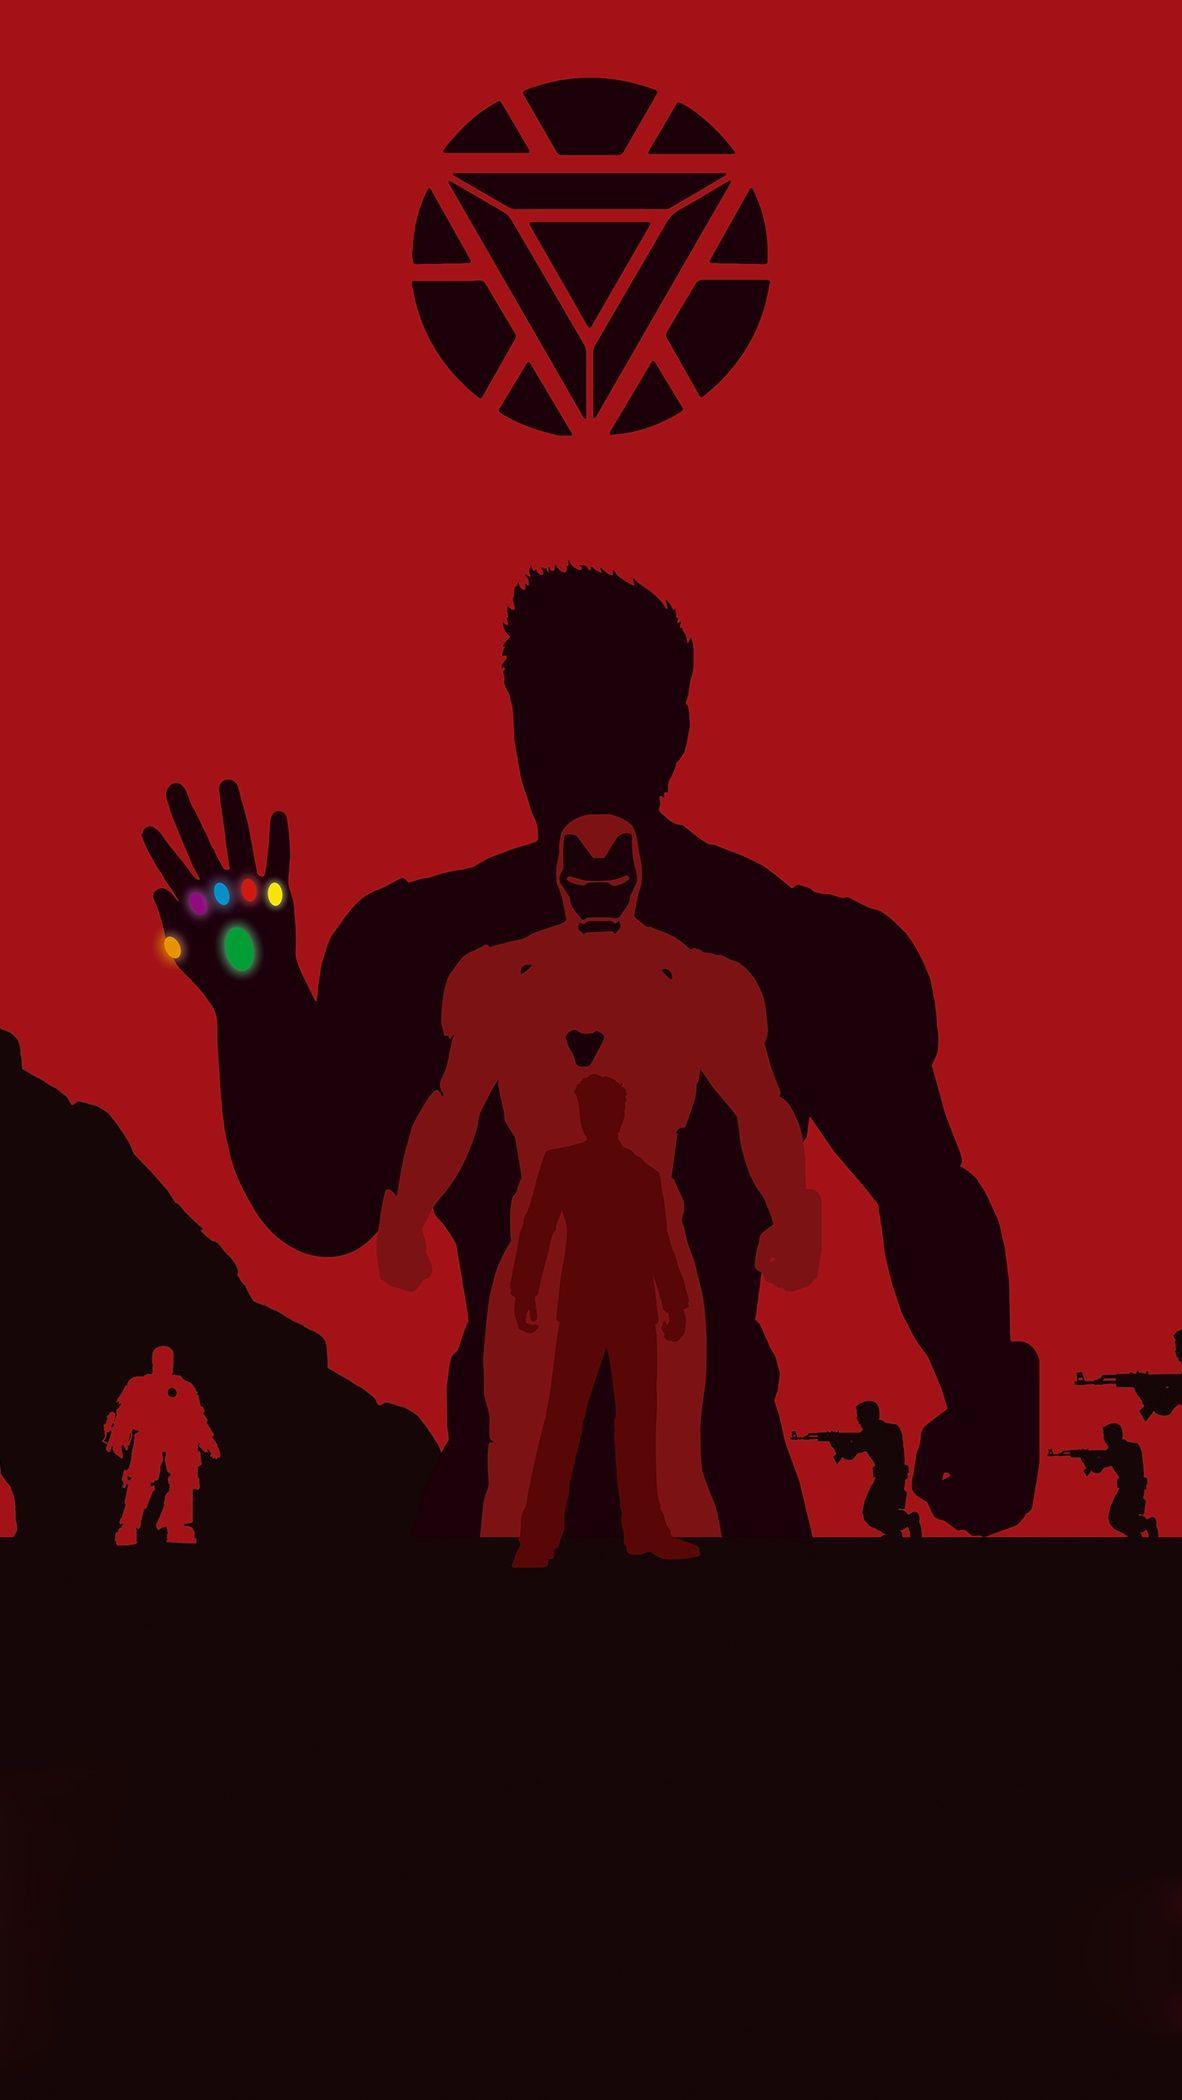 The Iron Man Iphone Wallpaper Iphone Wallpapers Iron Man Avengers Marvel Iron Man Marvel Superheroes